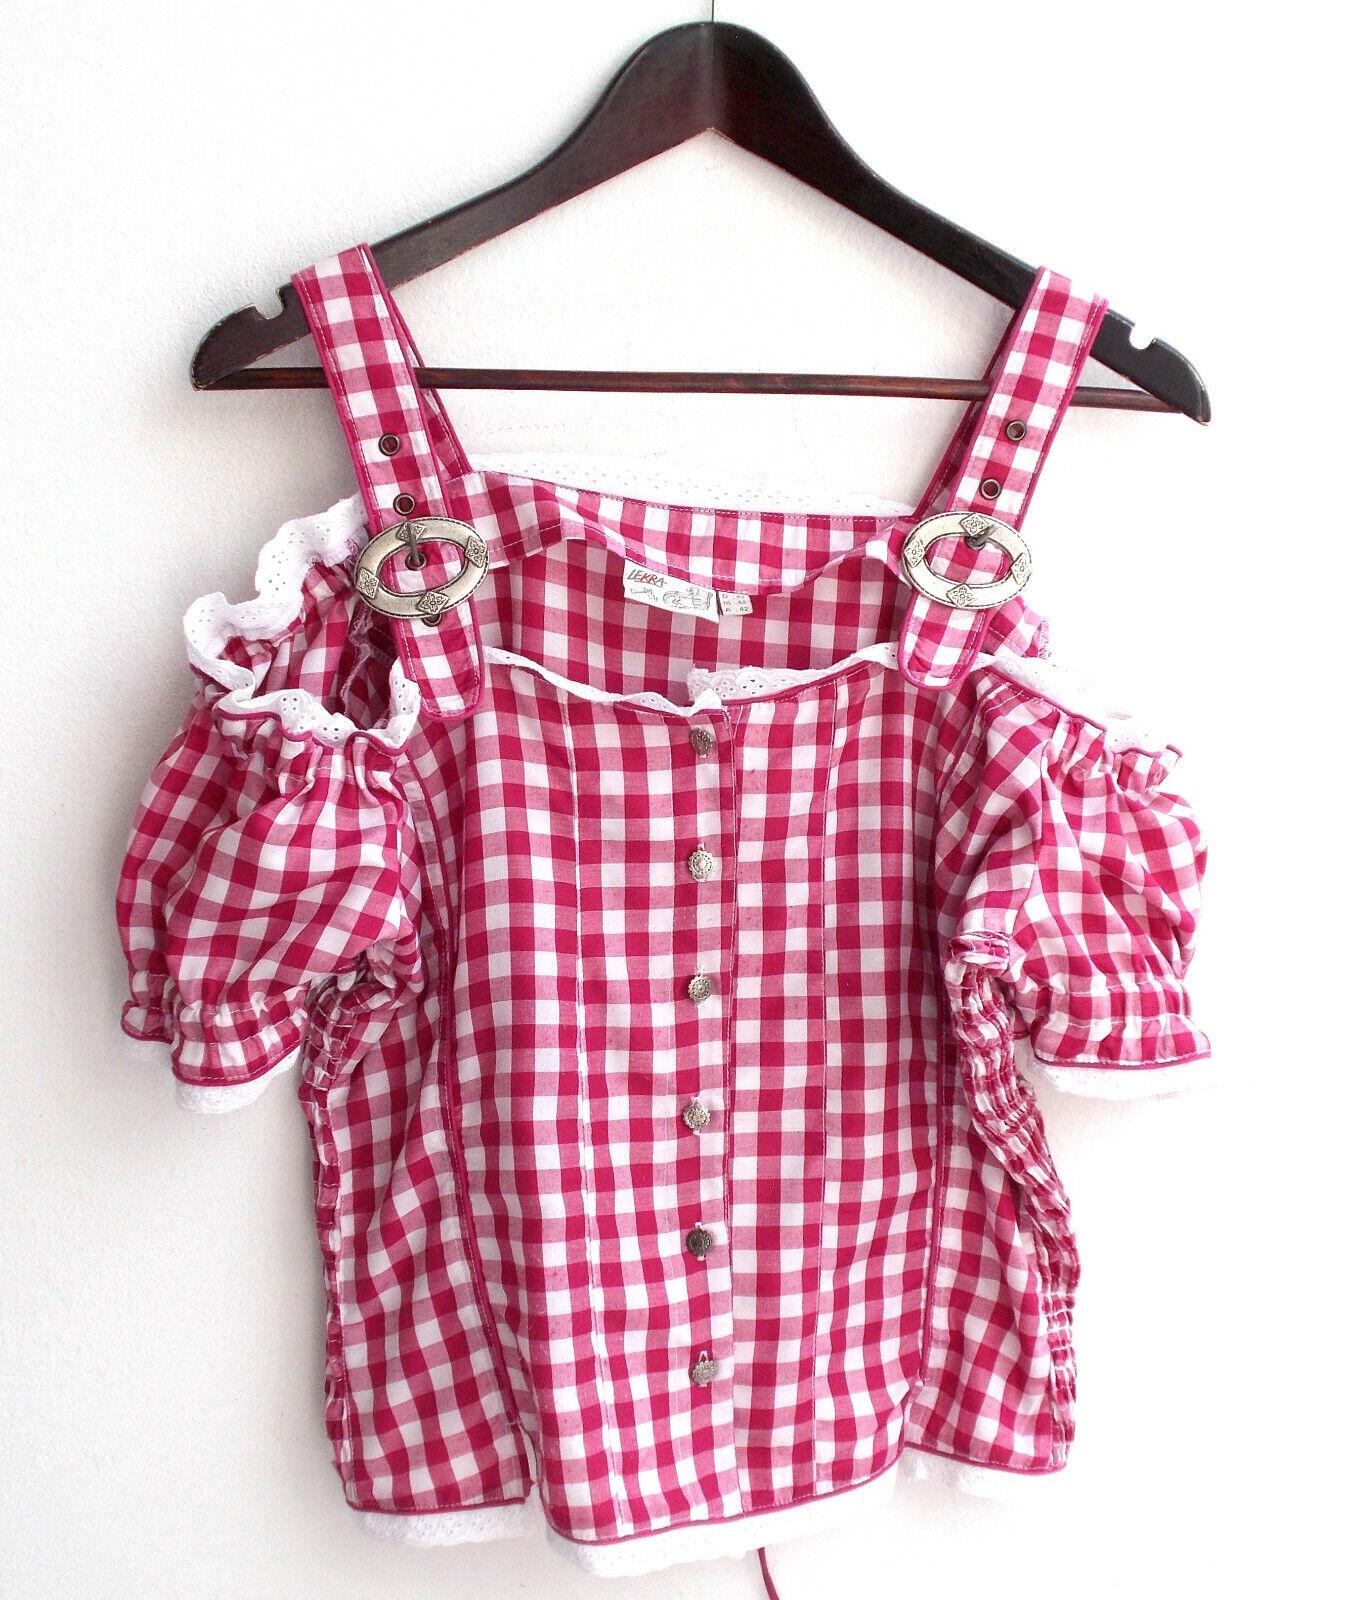 Damen Trachten Bluse pink weiß kariert Gr. 42 v. Country Life